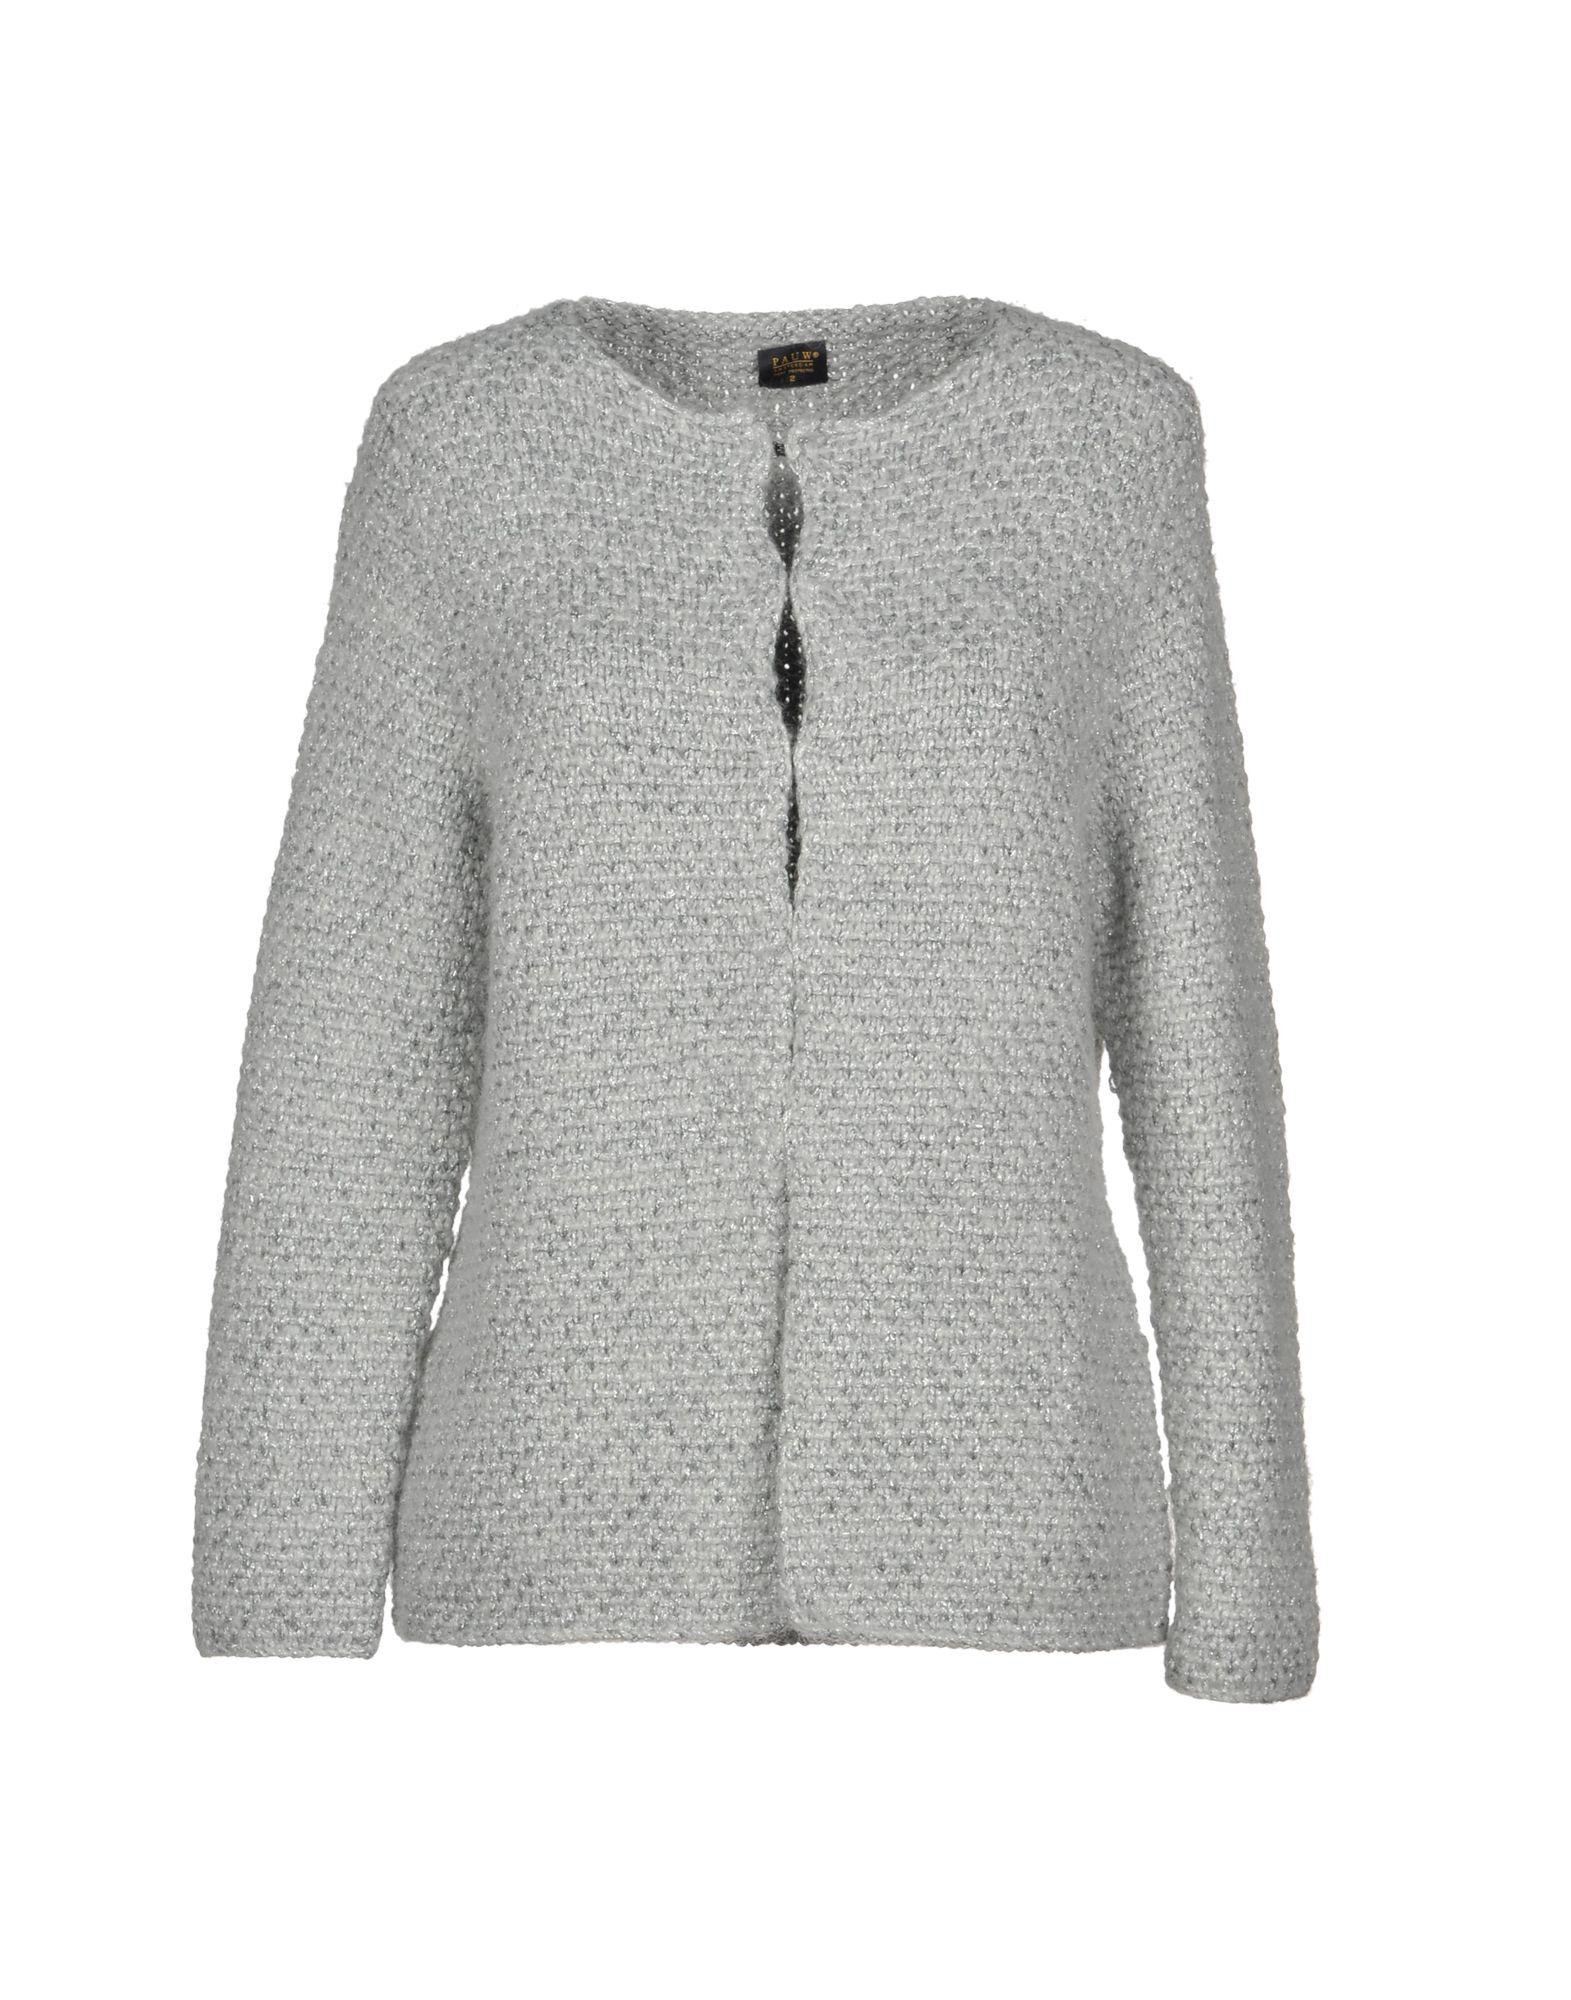 PAUW Cardigan in Light Grey